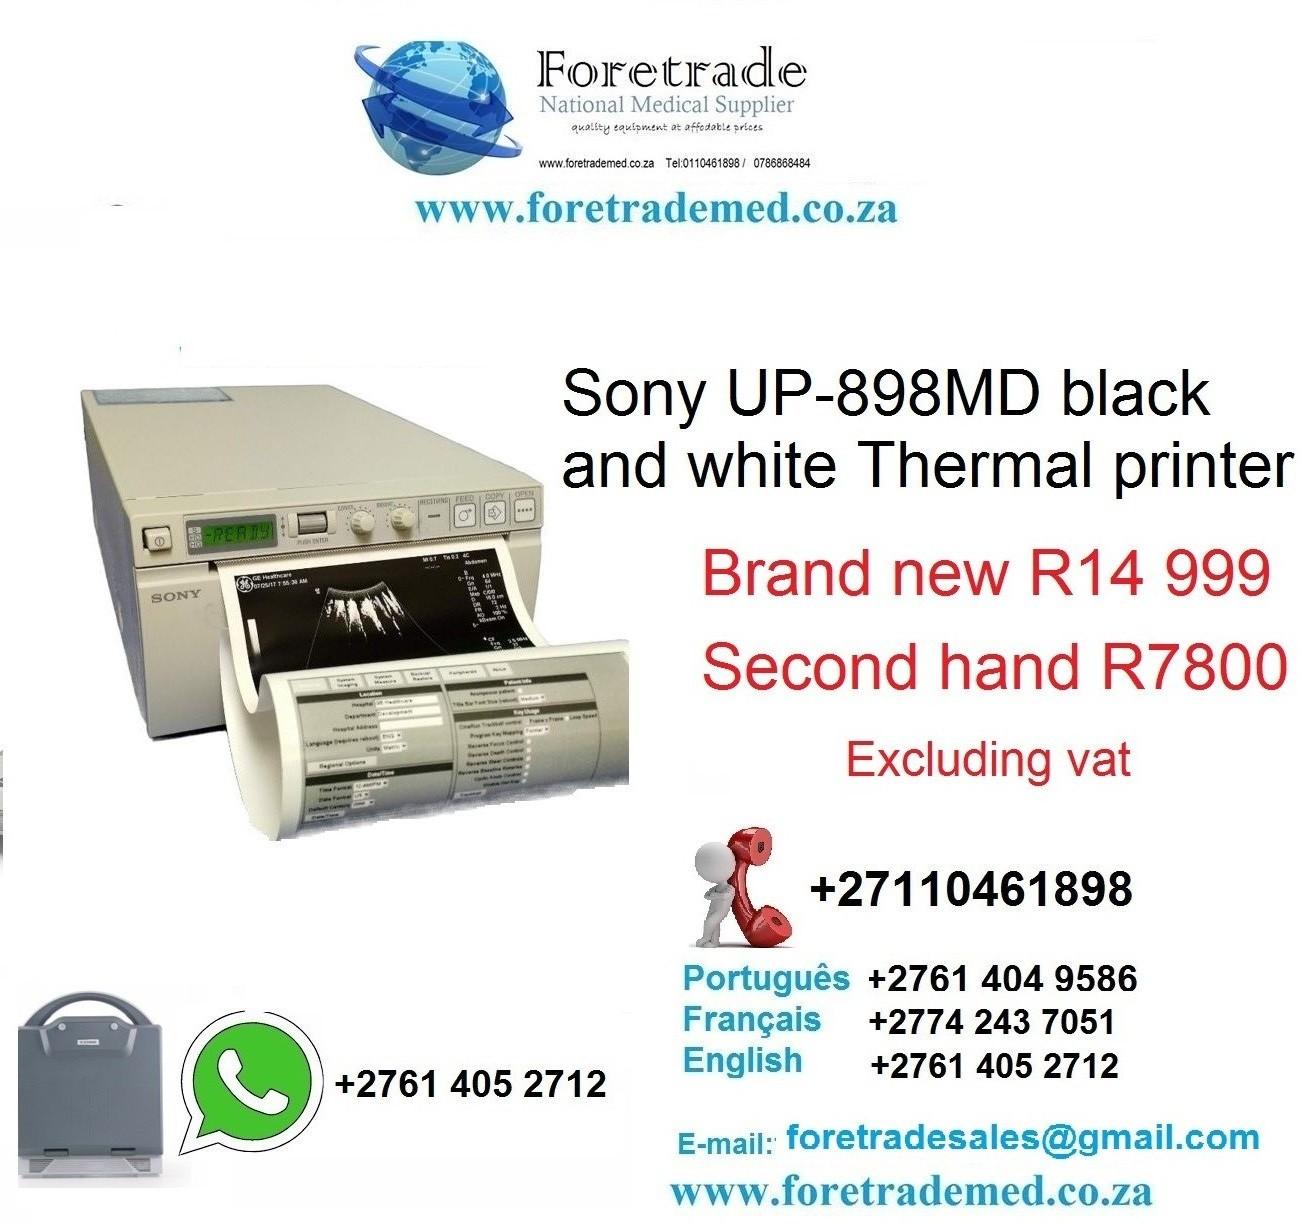 Sony Ultrasound Printer R14 999